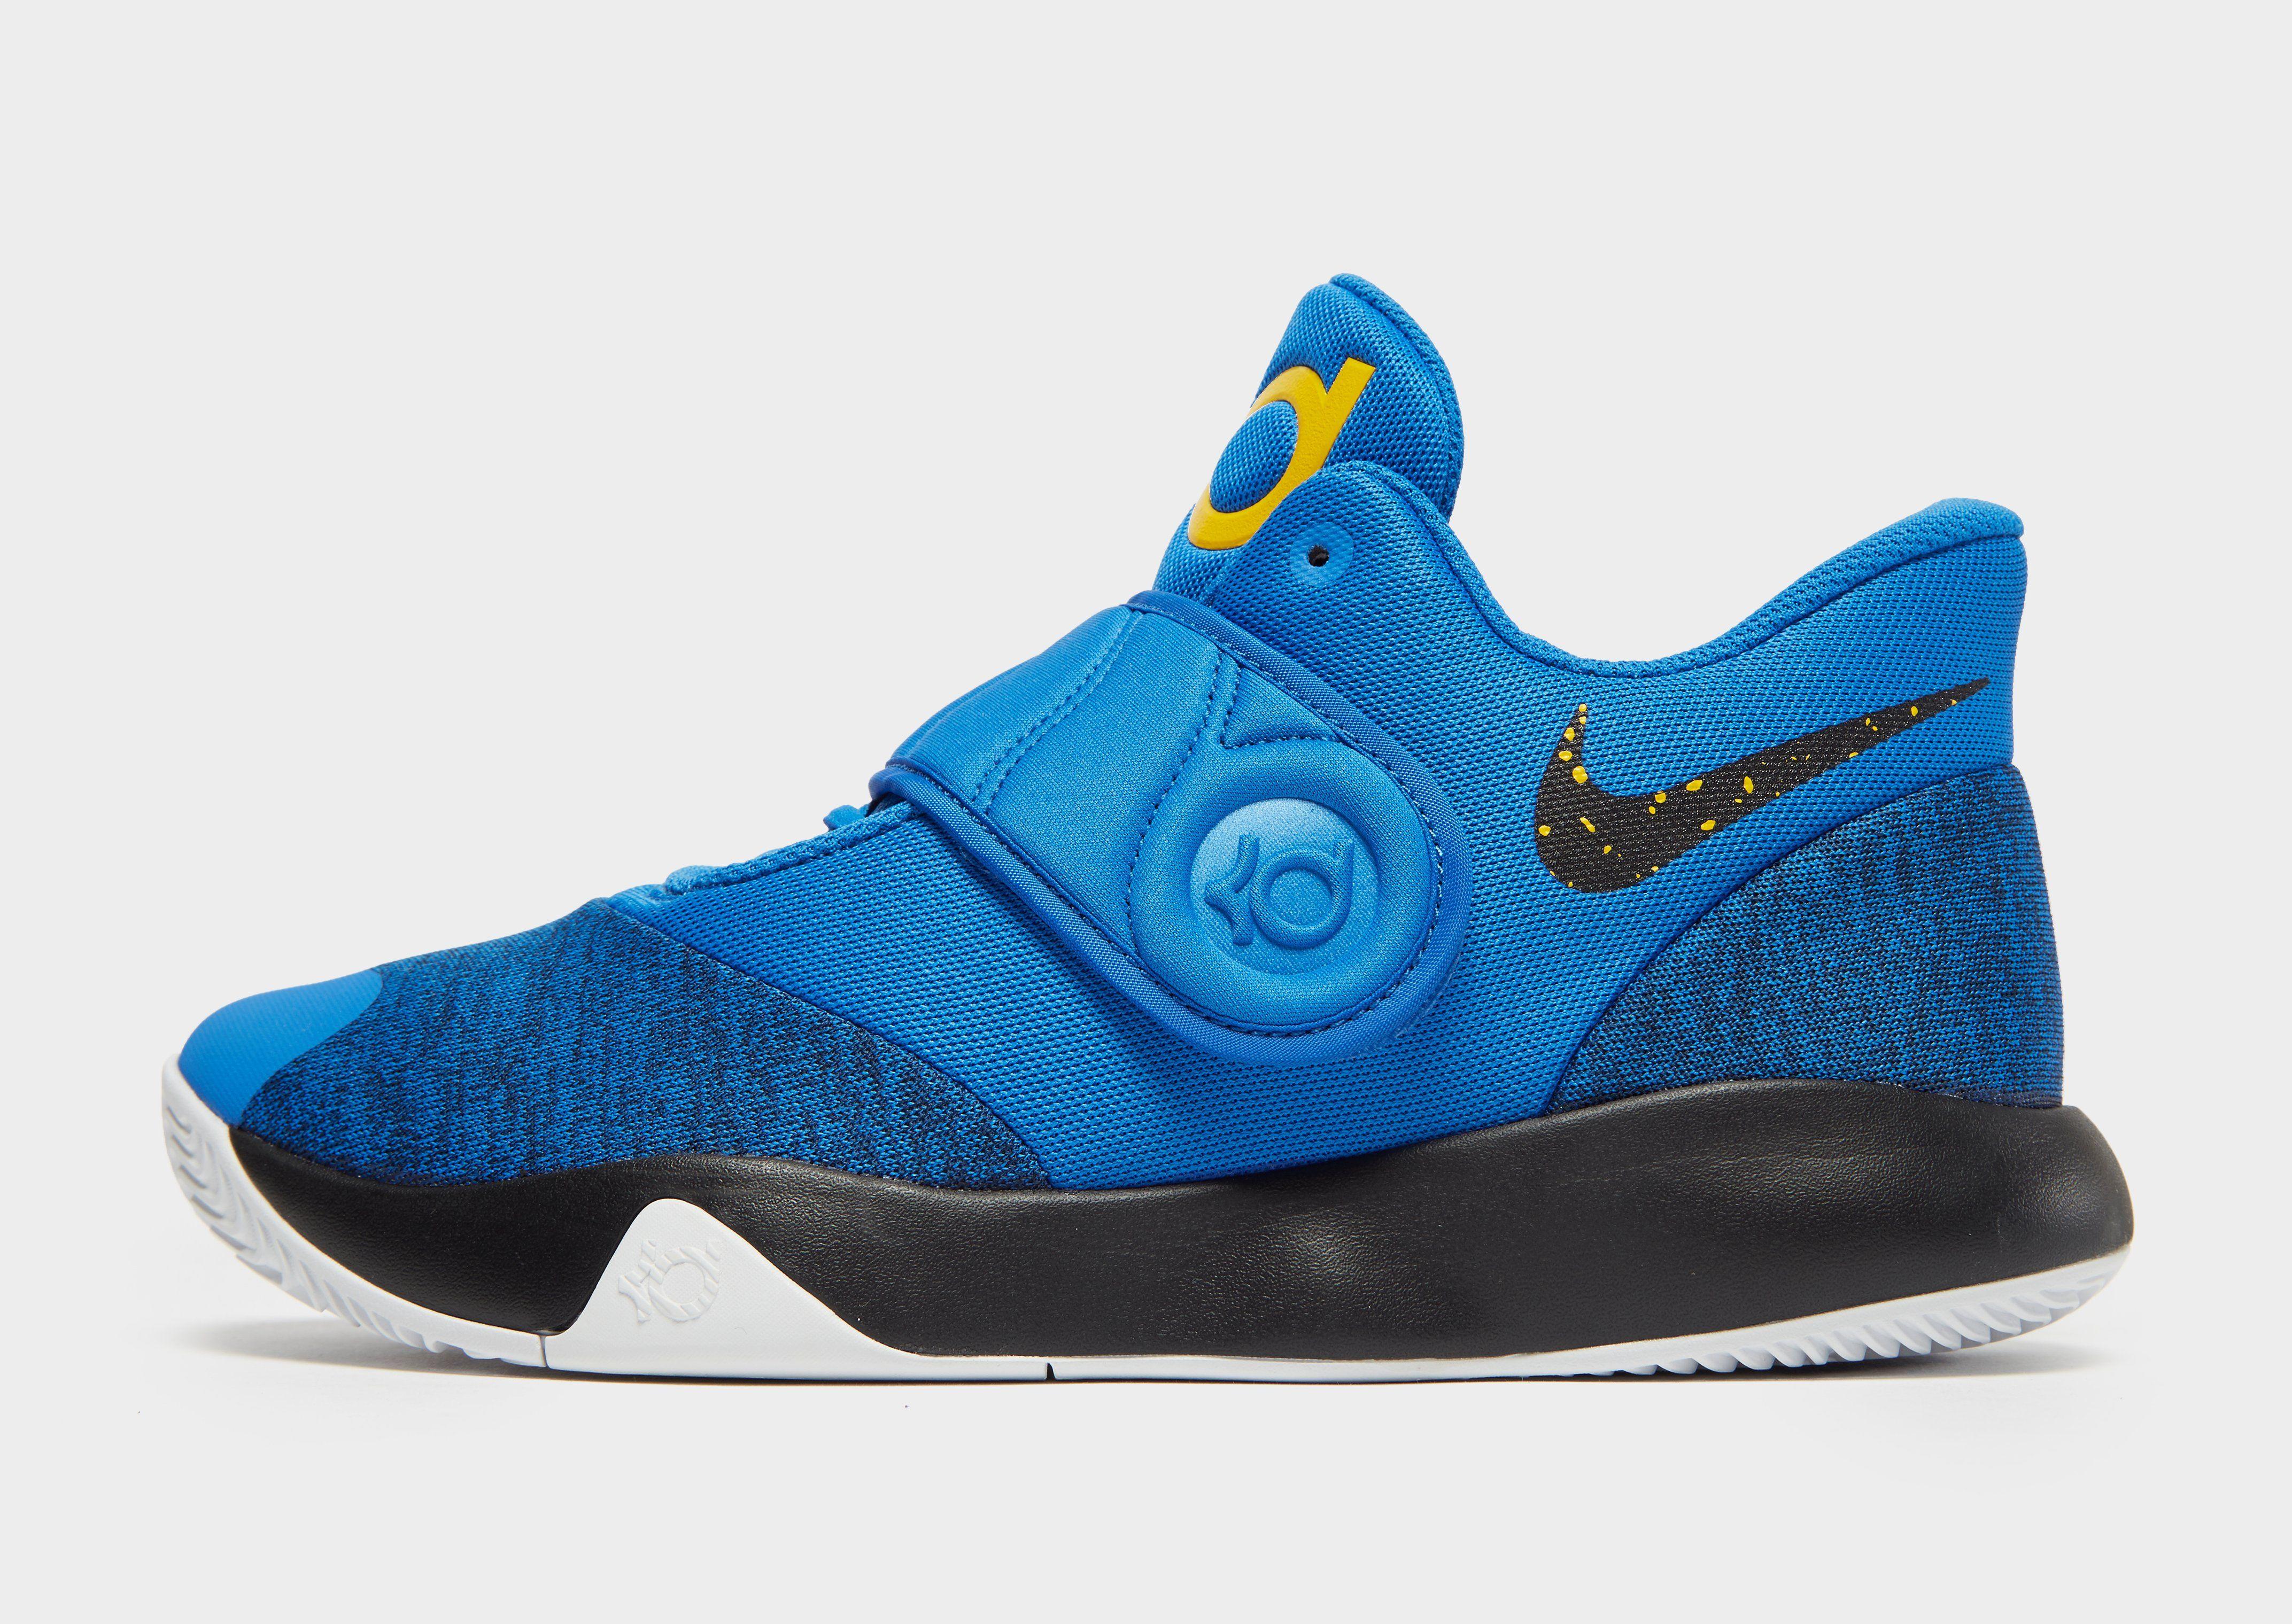 wholesale dealer 8cead ab58d NIKE Nike KD Trey 5 VI Basketball Shoe   JD Sports